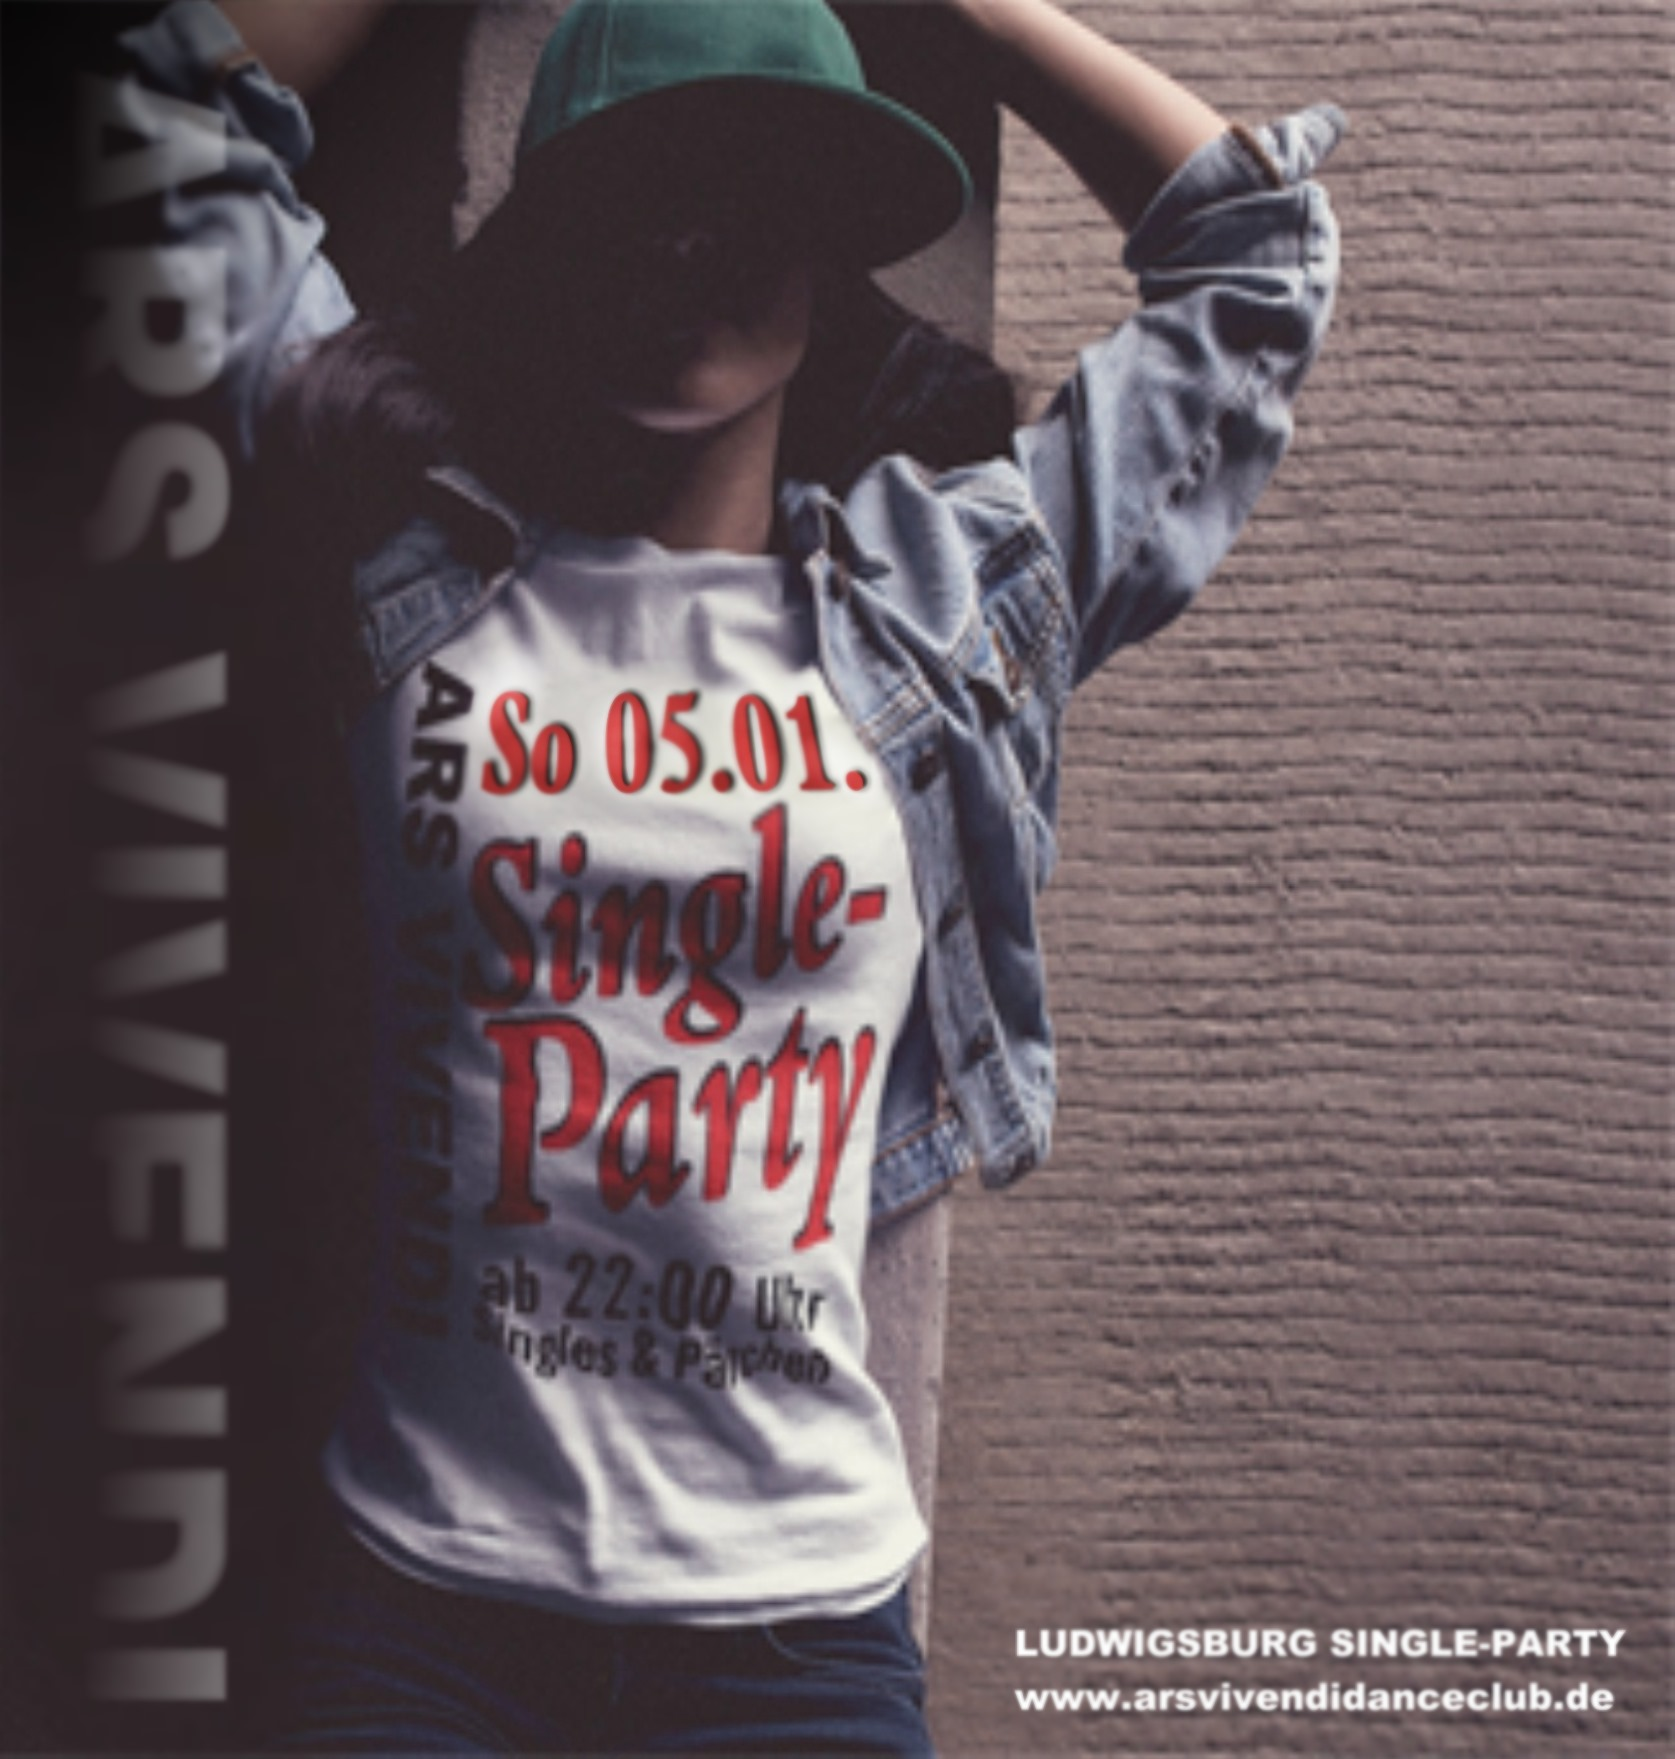 Tanzkurse für singles in ludwigsburg